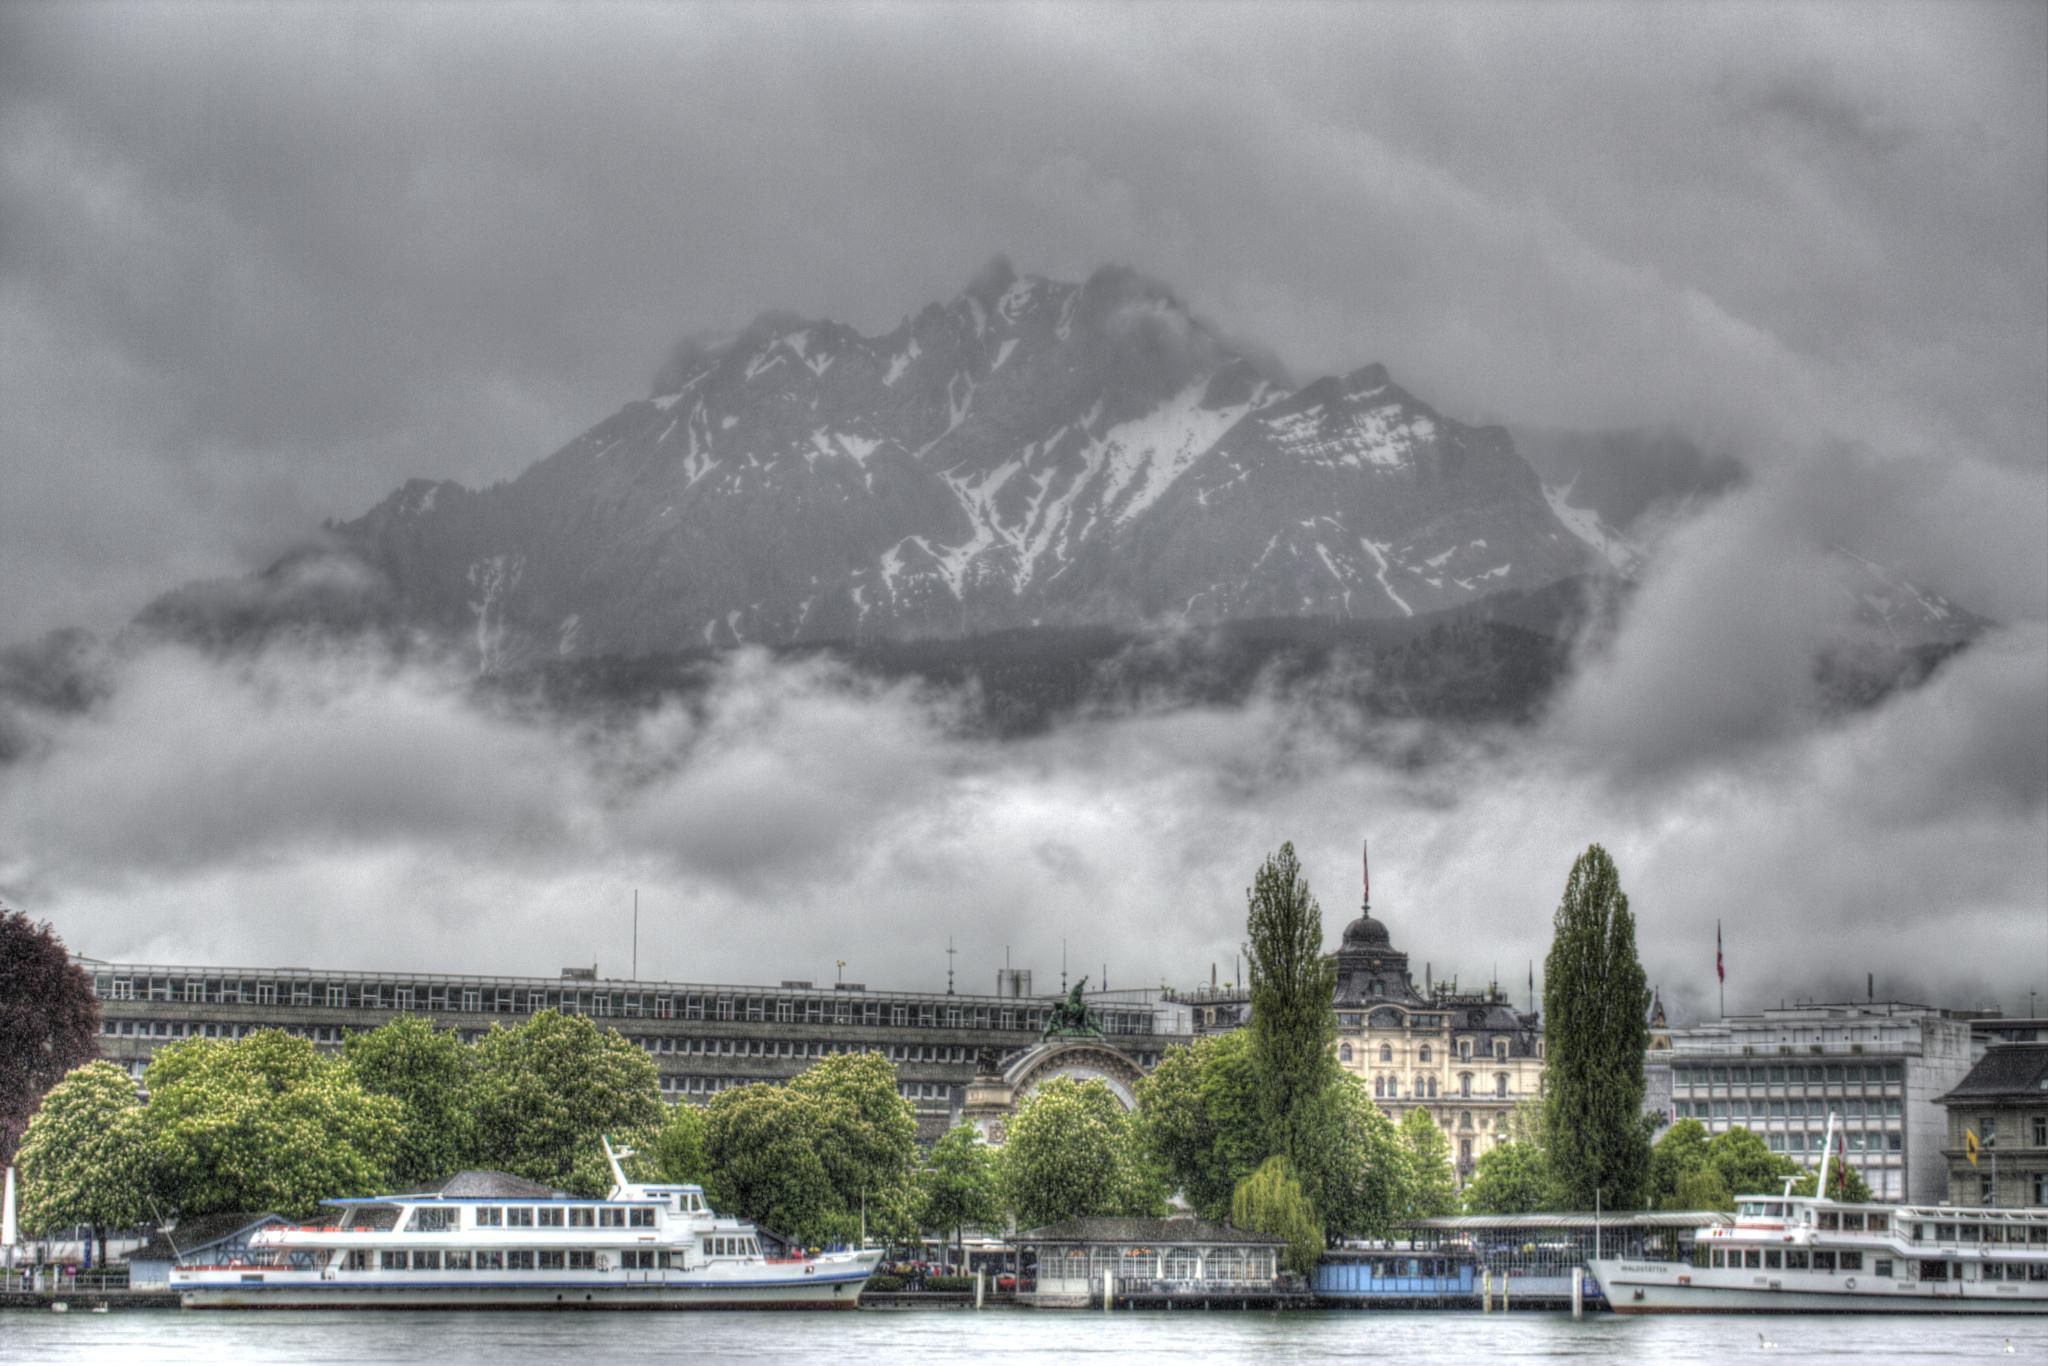 Rainy day by robert.martinek.18